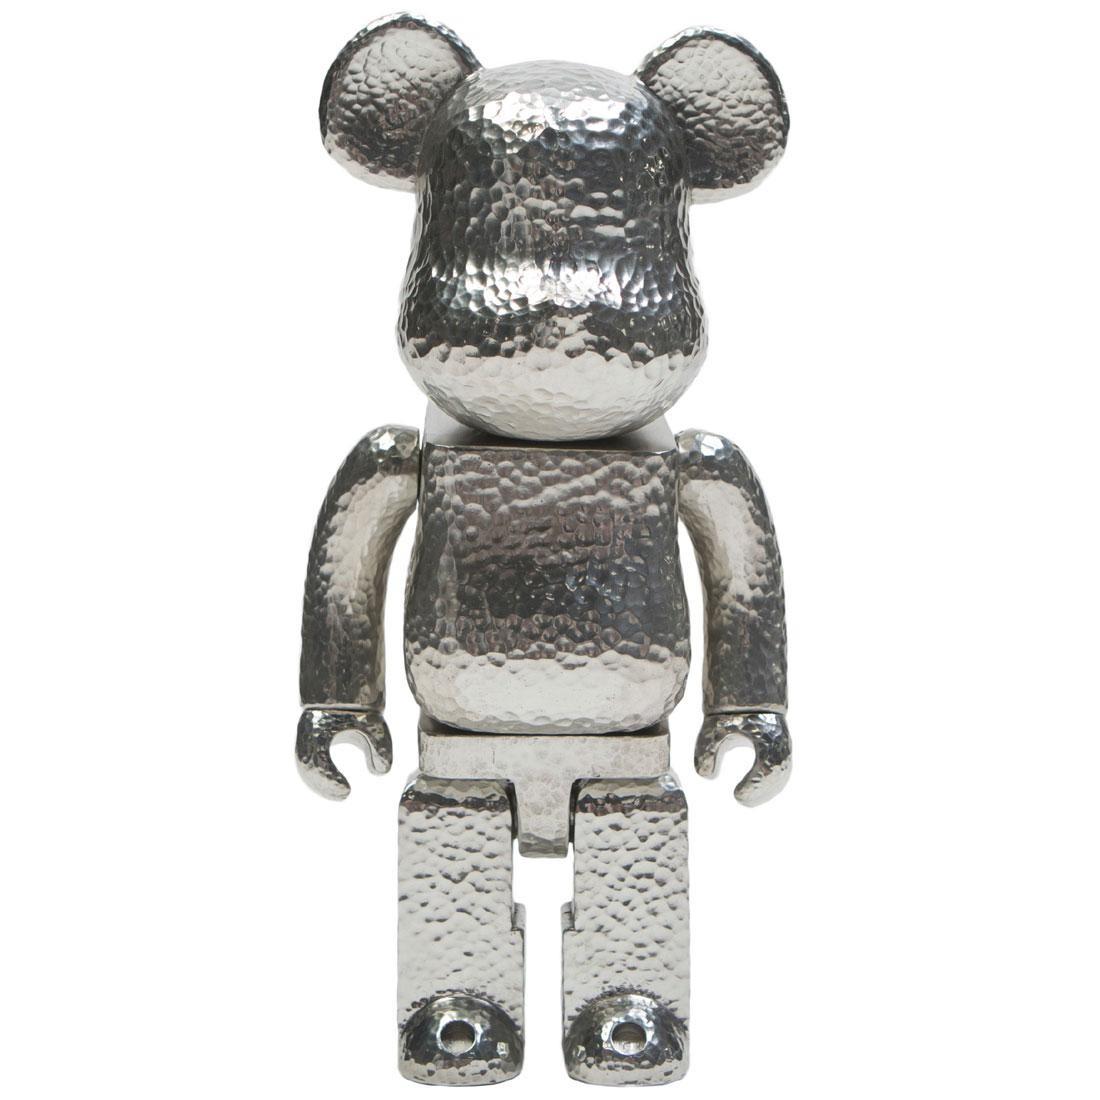 Medicom Royal Selangor 400% Bearbrick Figure silver